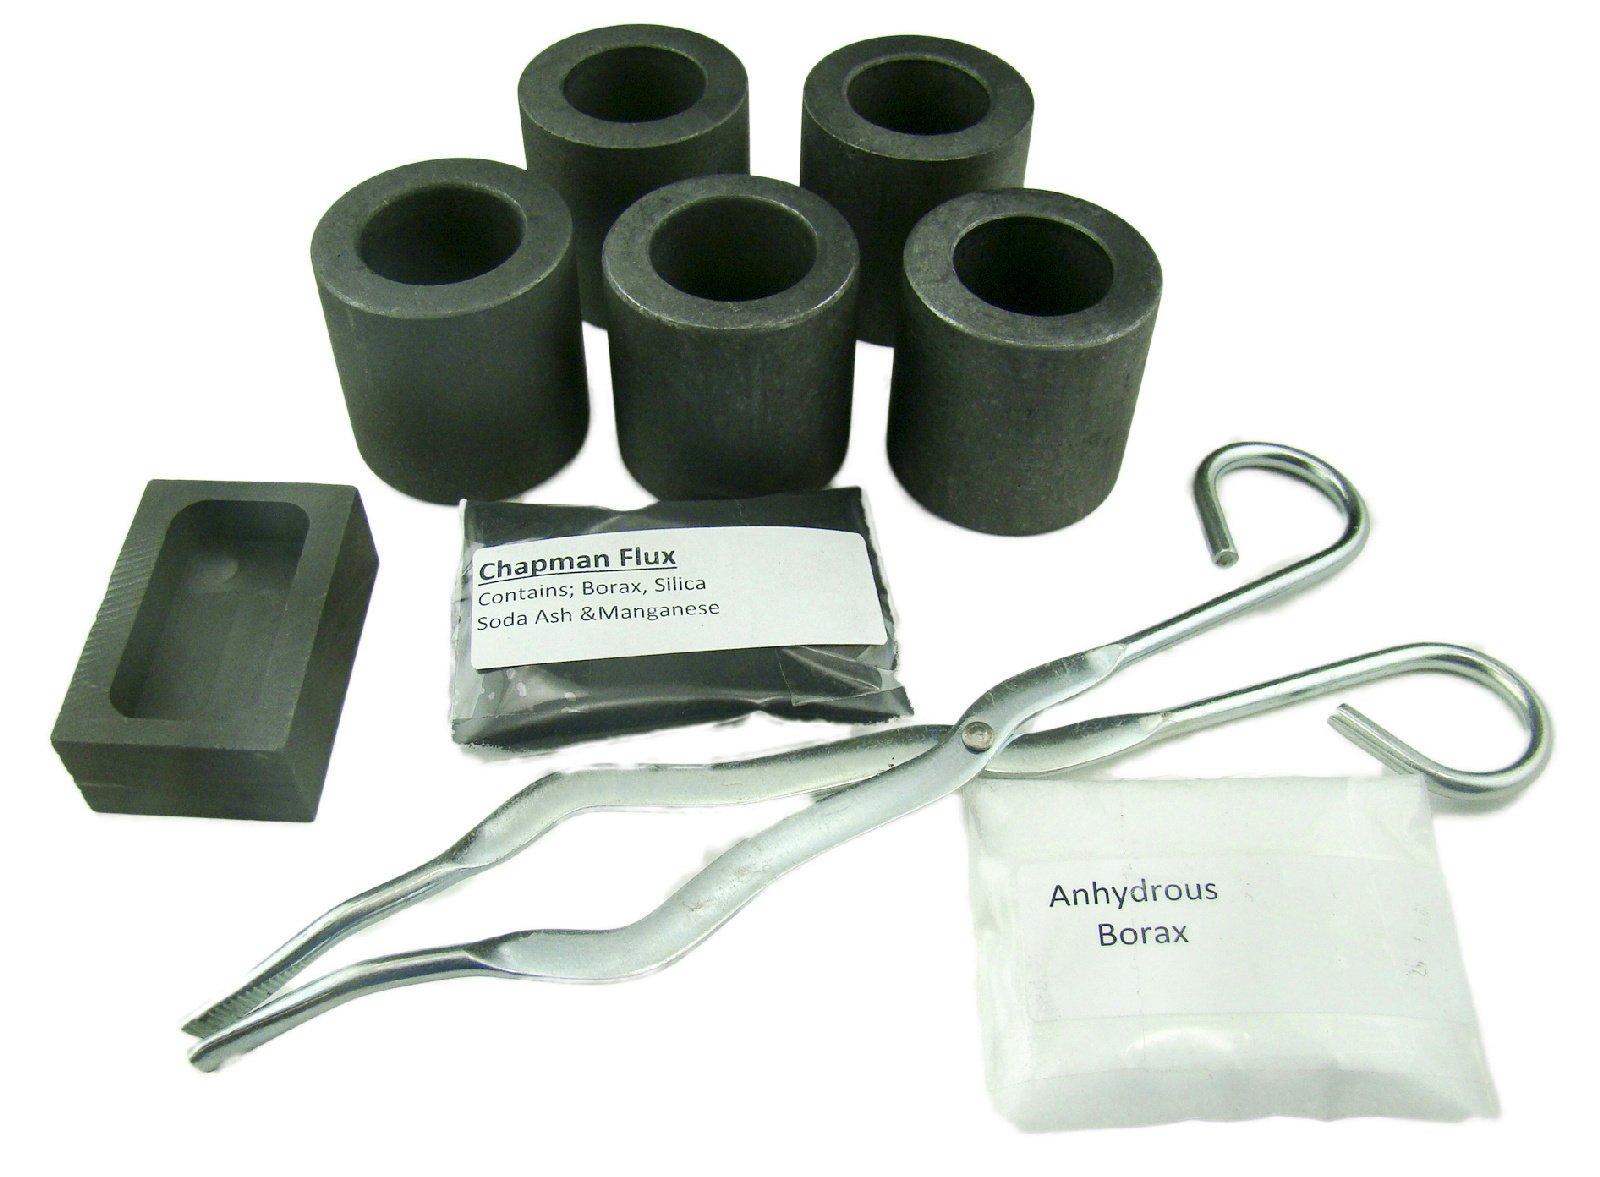 Gold & Silver Melting Kit - 5 Crucibles, Tongs, 5oz Mold, Chapman Flux, Borax-Gold Recovery-Melting-Smelting